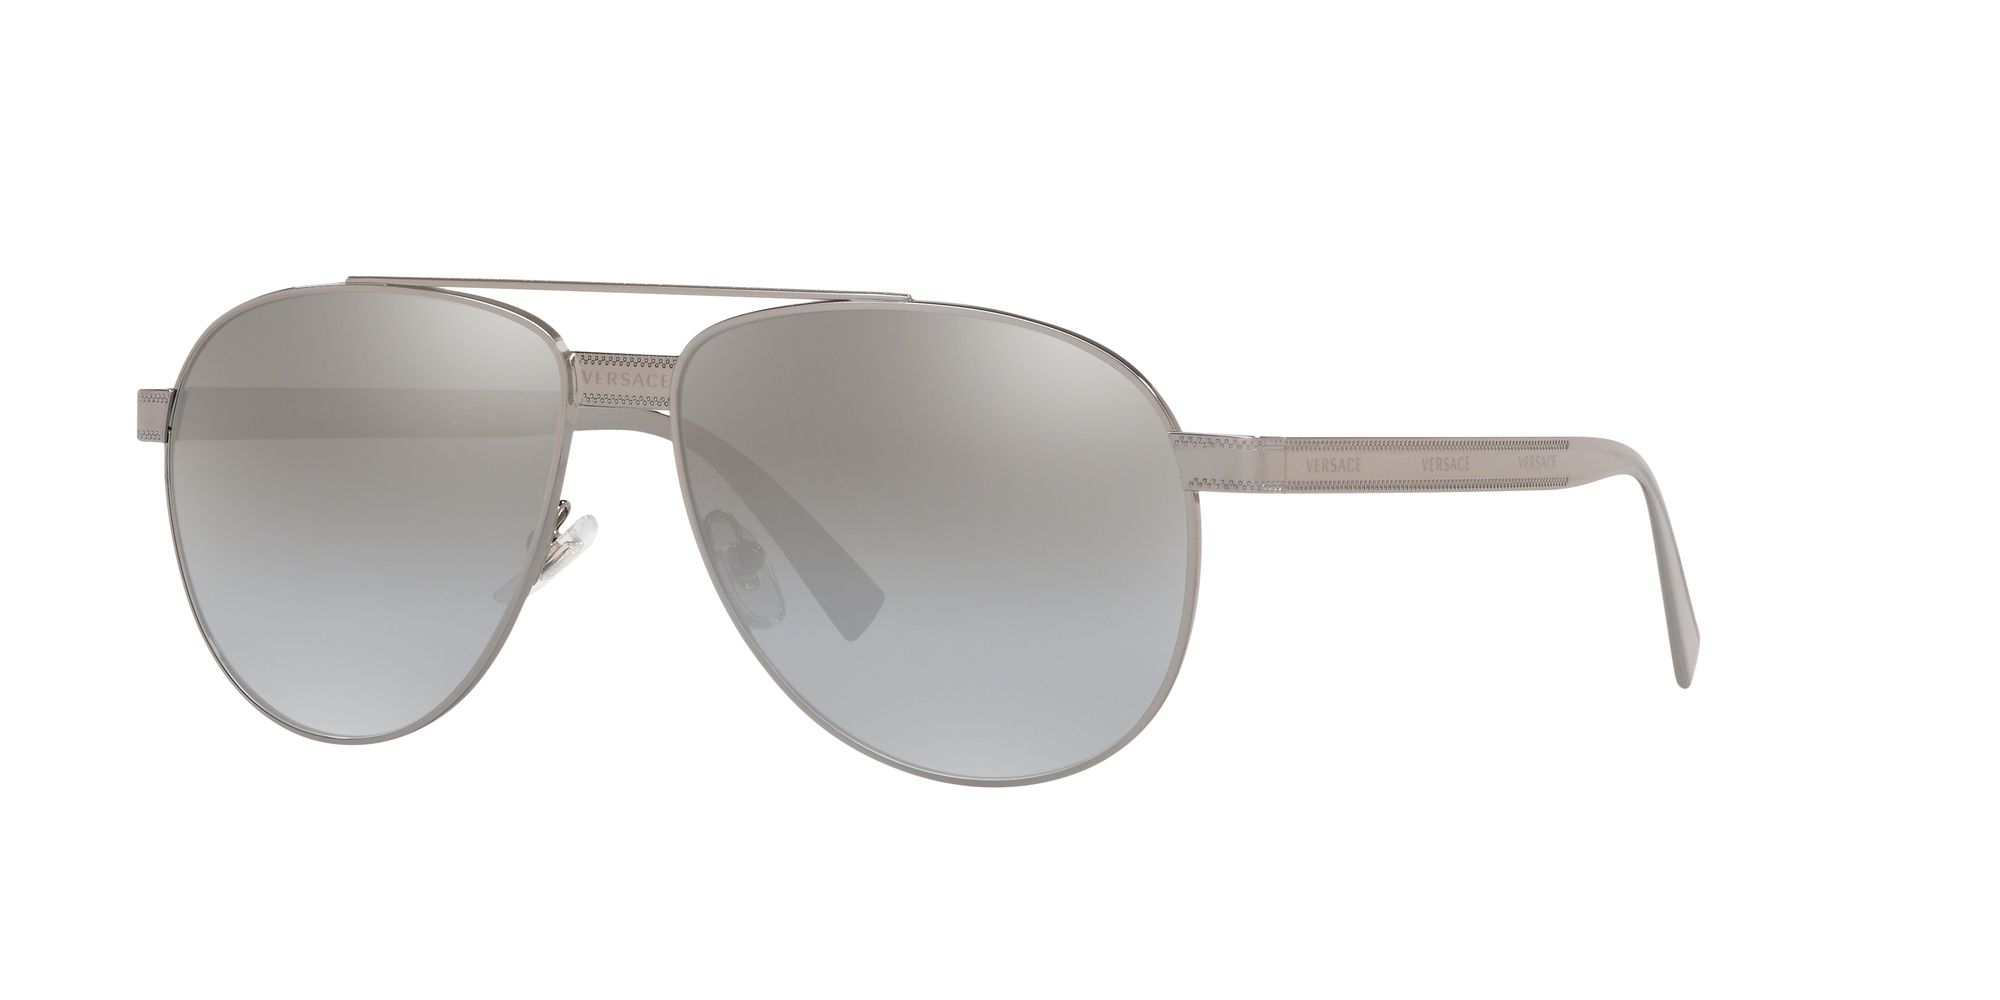 Versace Versace VE2209 Unisex Aviator Sunglasses, Gunmetal/Mirror Grey